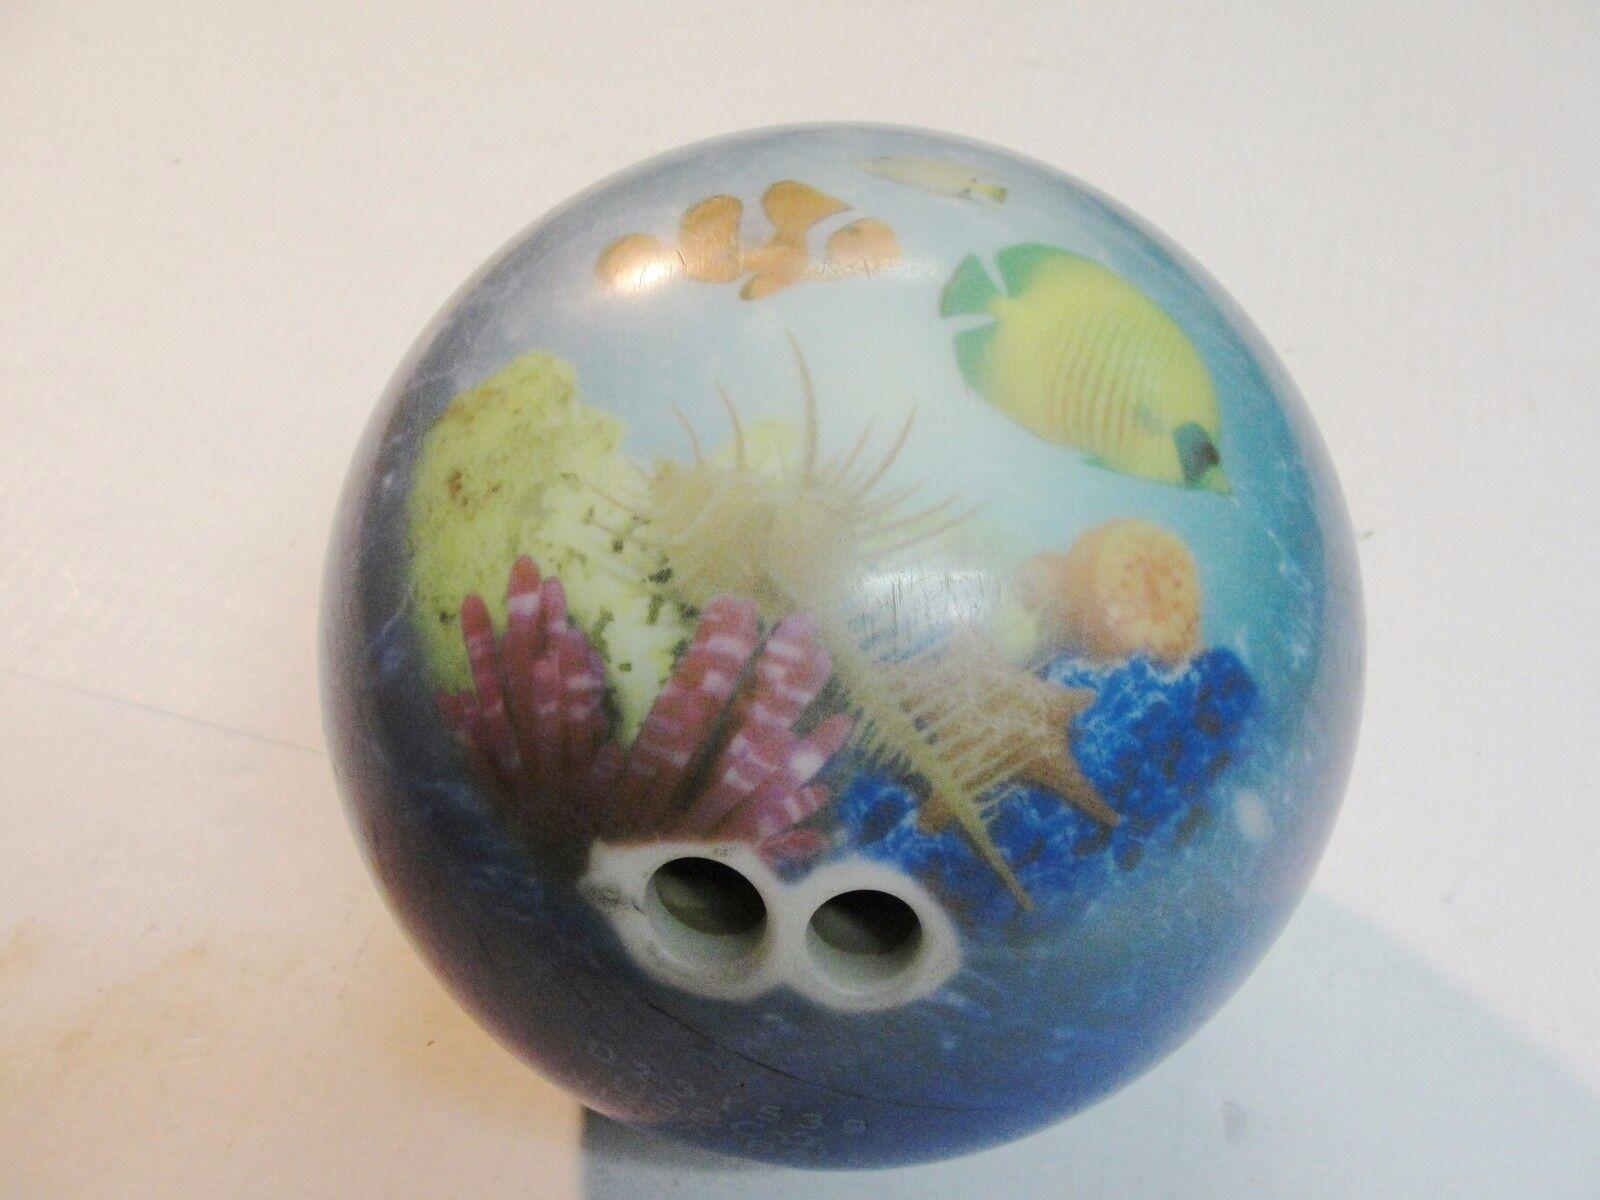 Brunswick Bowling Ball 15 Lb Viz-a-ball Ocean Sea Life Bowling Ball Usbc